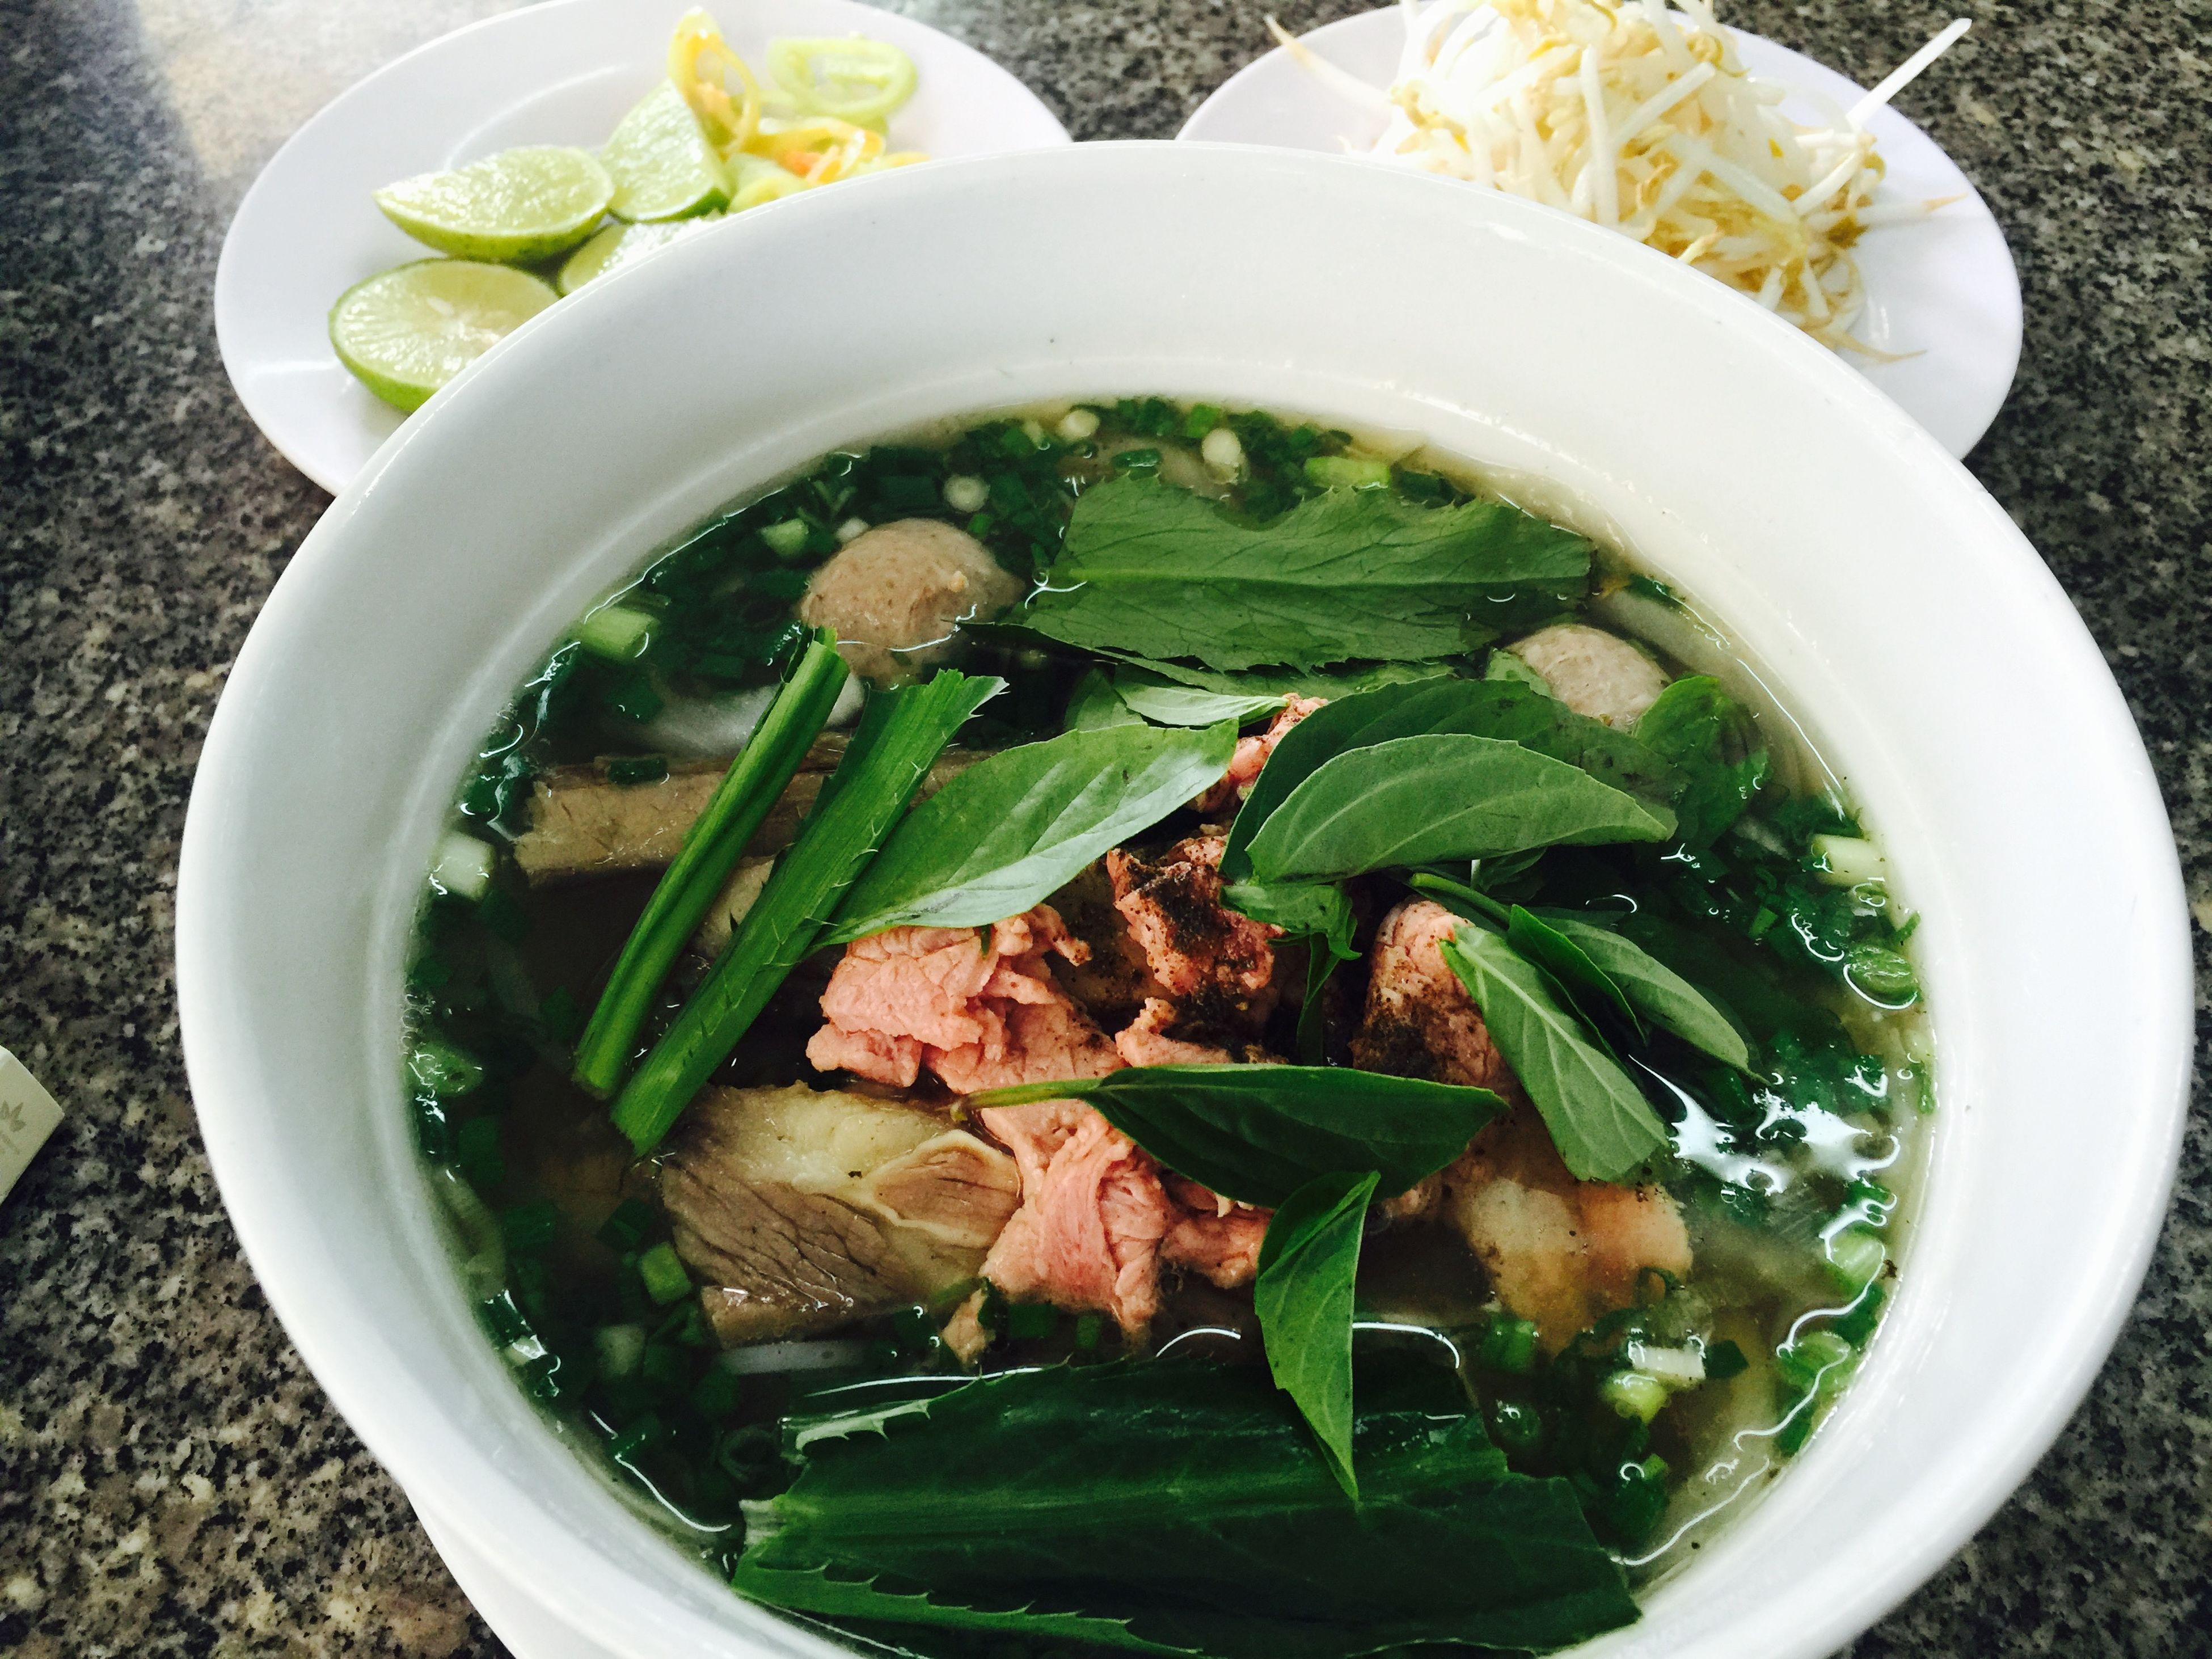 Pho Dac Biet Pho Bo Vietnamese Food Foodporn